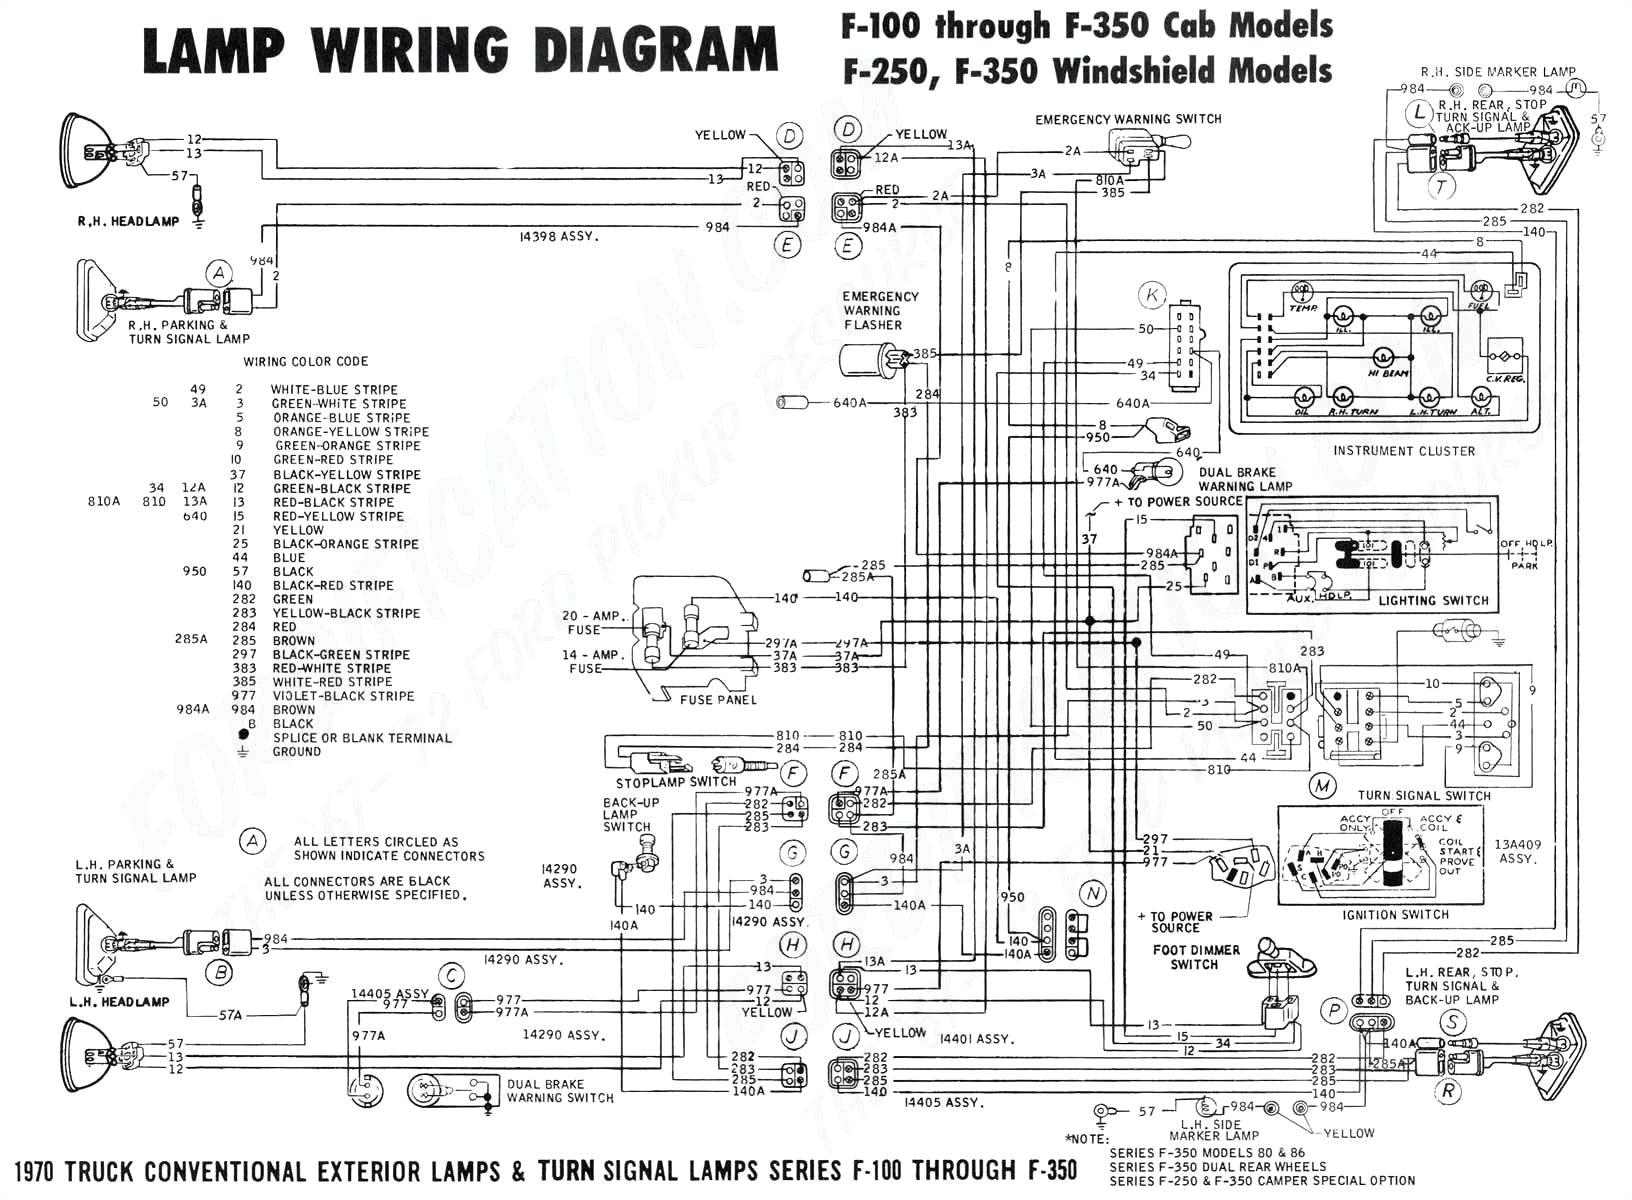 tsubaki wiring diagram wiring diagram schematsubaki wiring diagram wiring diagram schematic tsubaki wiring diagram